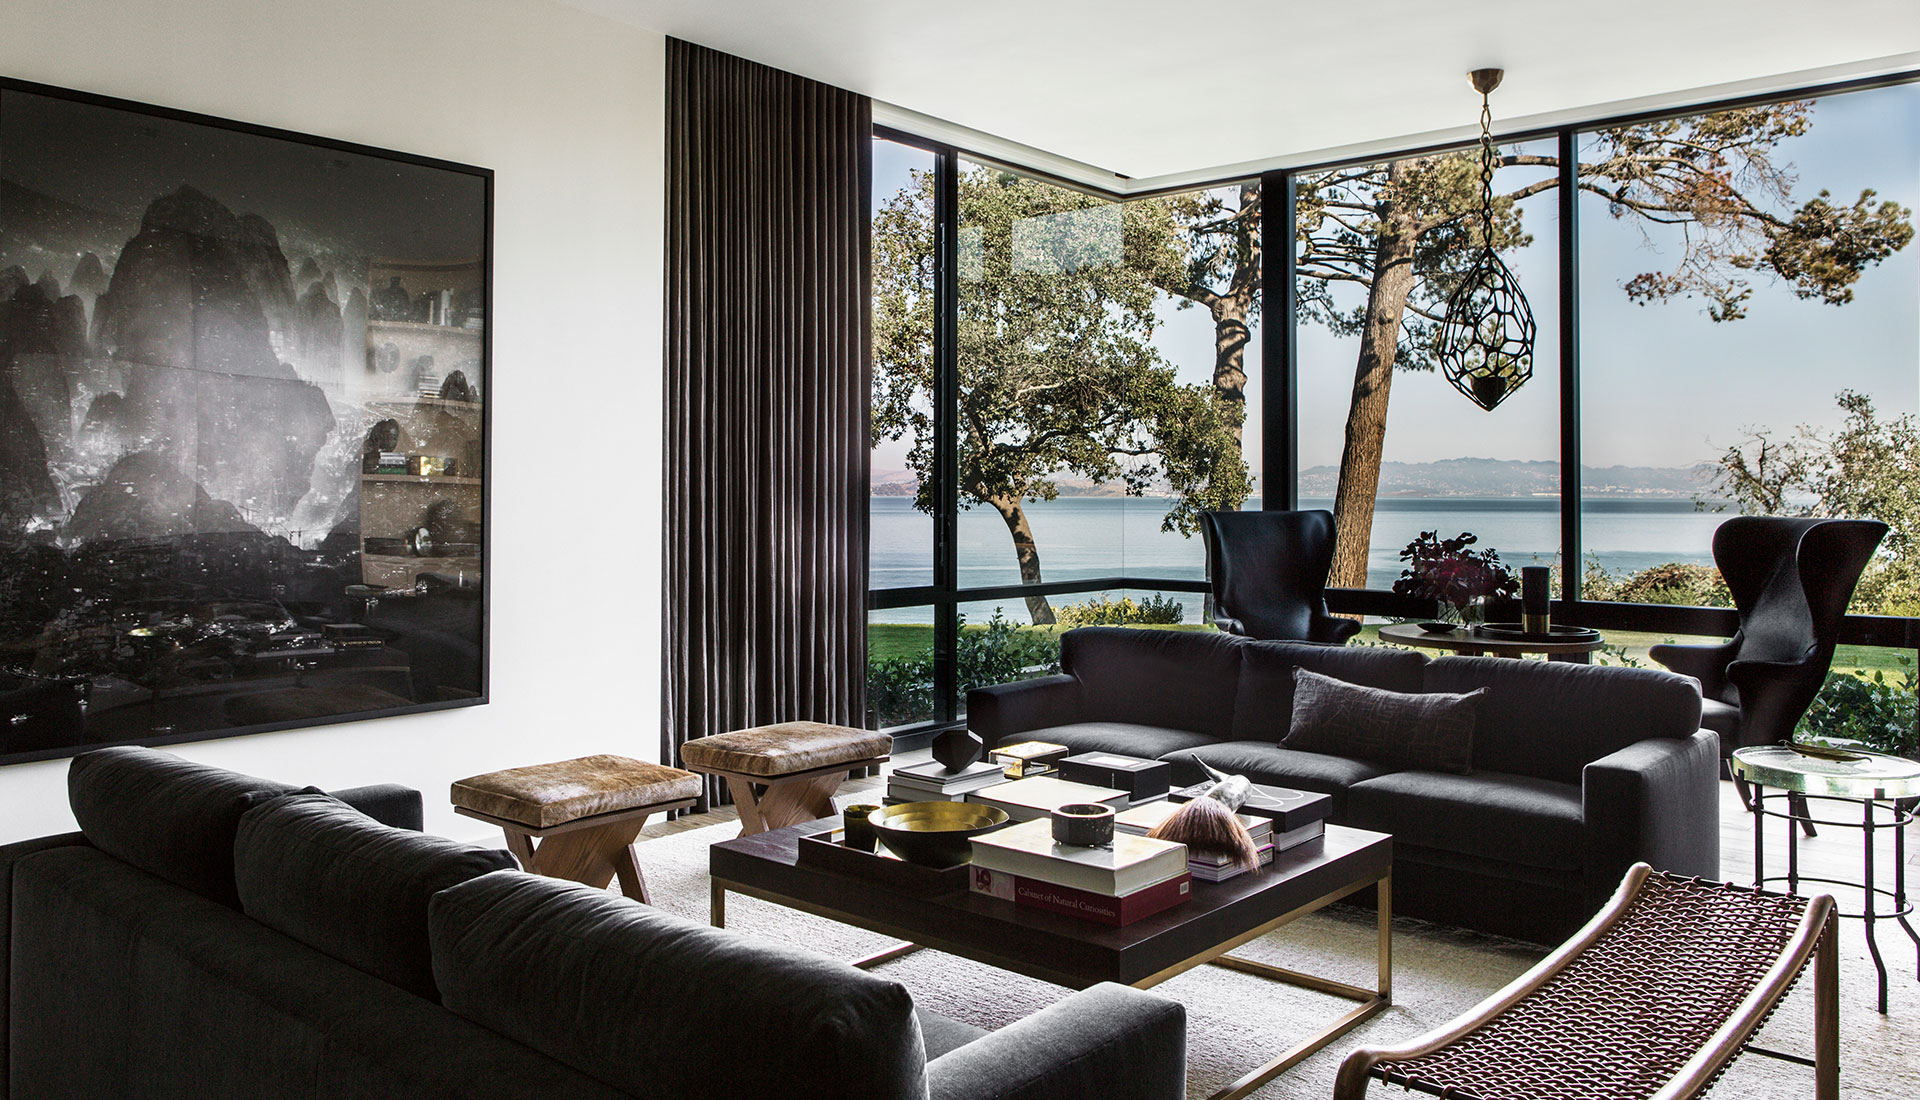 Walker Warner Architects: резиденция Tiburon Bay в Калифорнии